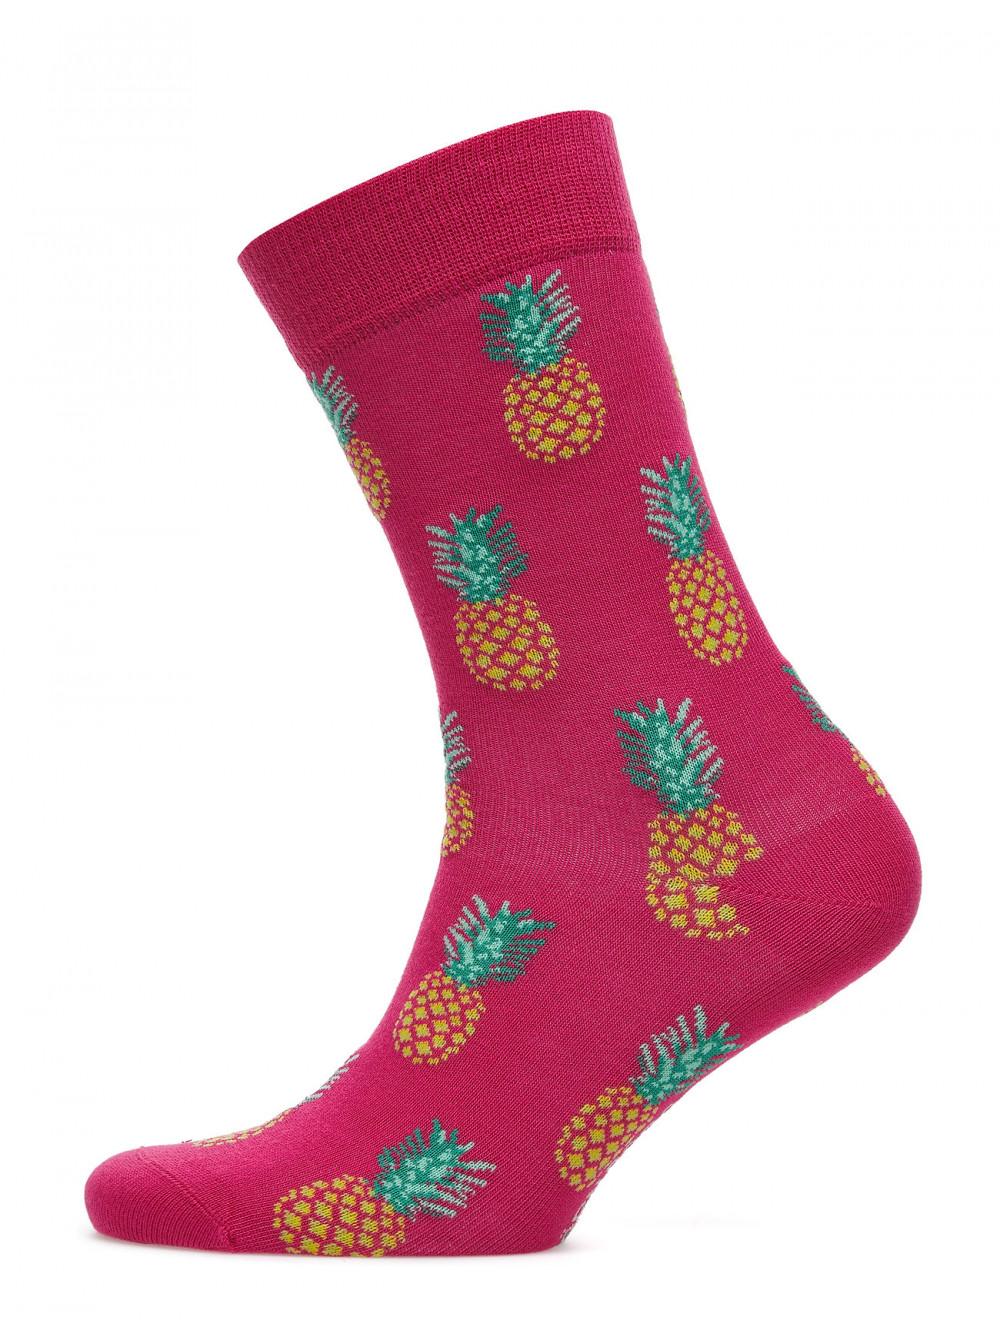 Ponožky Björn Borg La Pineapple Mini ružové